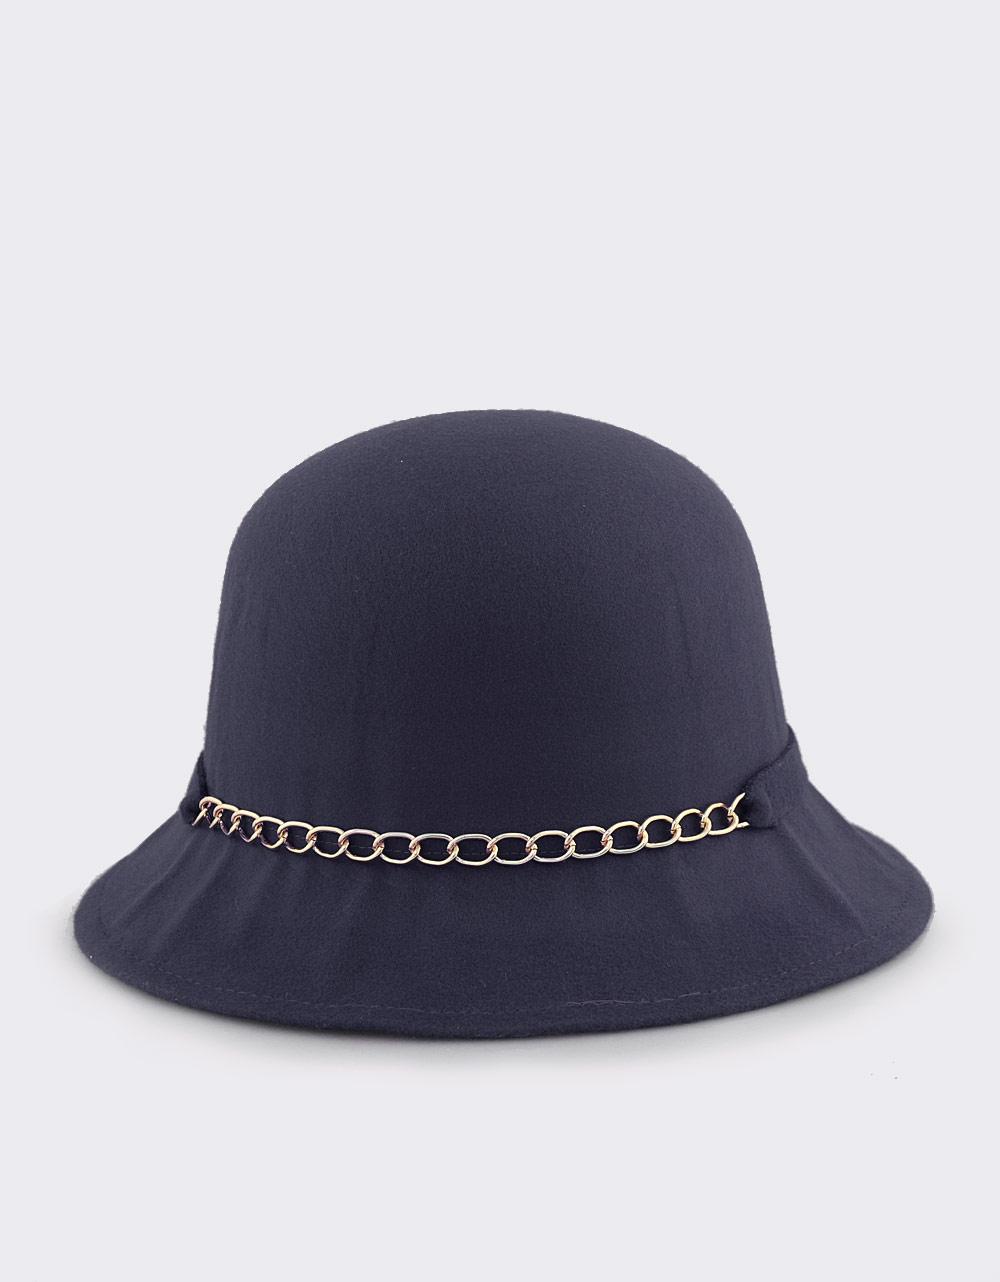 b077e32b57 Εικόνα από Γυναικεία καπέλα με αλυσίδα και φιόγκο Μπλε